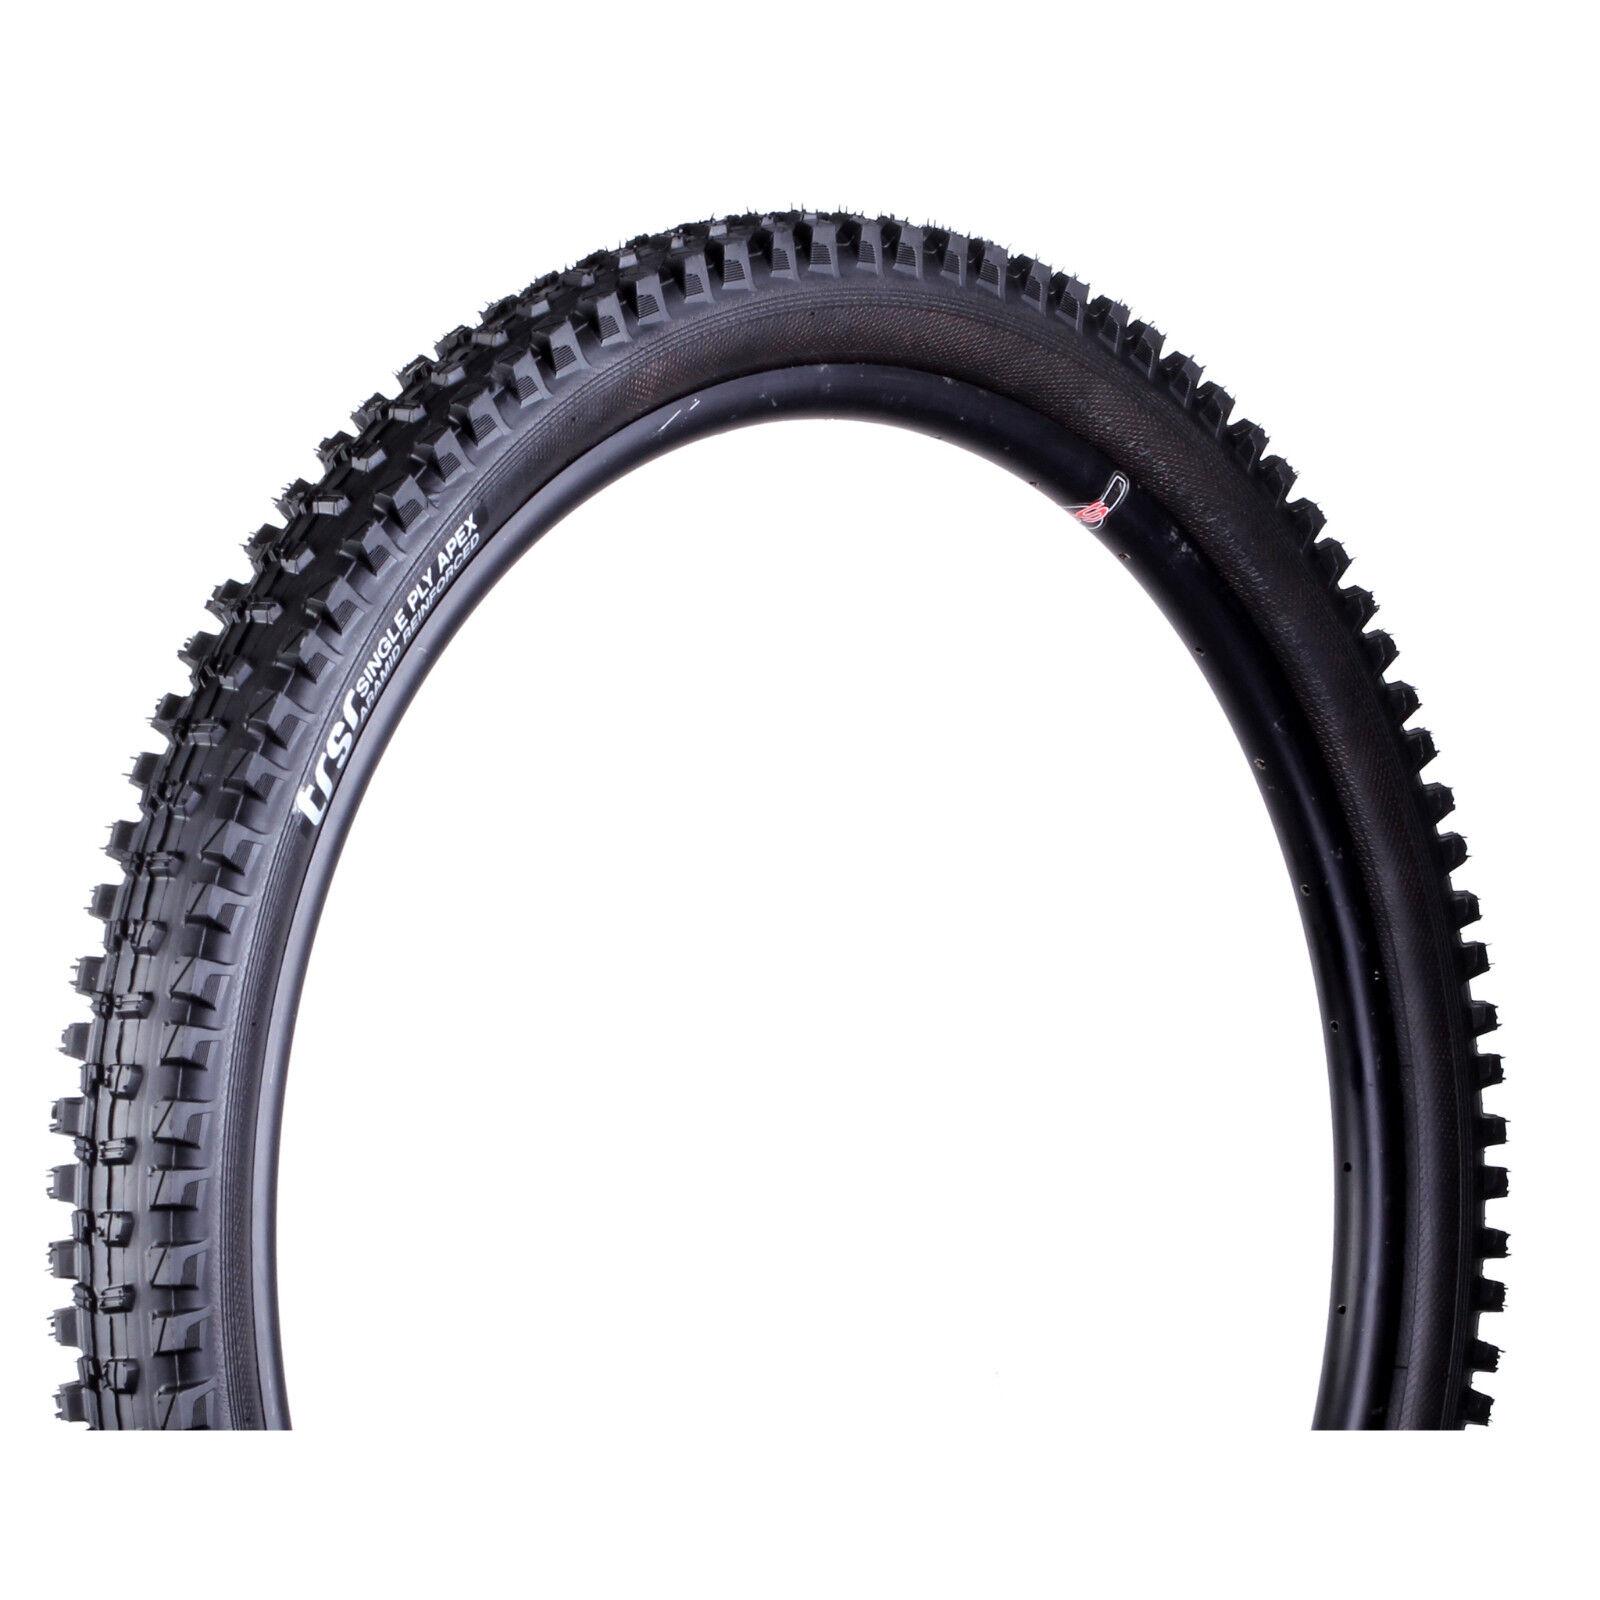 E 13 Thirteen Trs Rennen 29er Tubeless Ready MTB MTB MTB Mountain Bike Reifen 29 X 2.35 0aa1a0